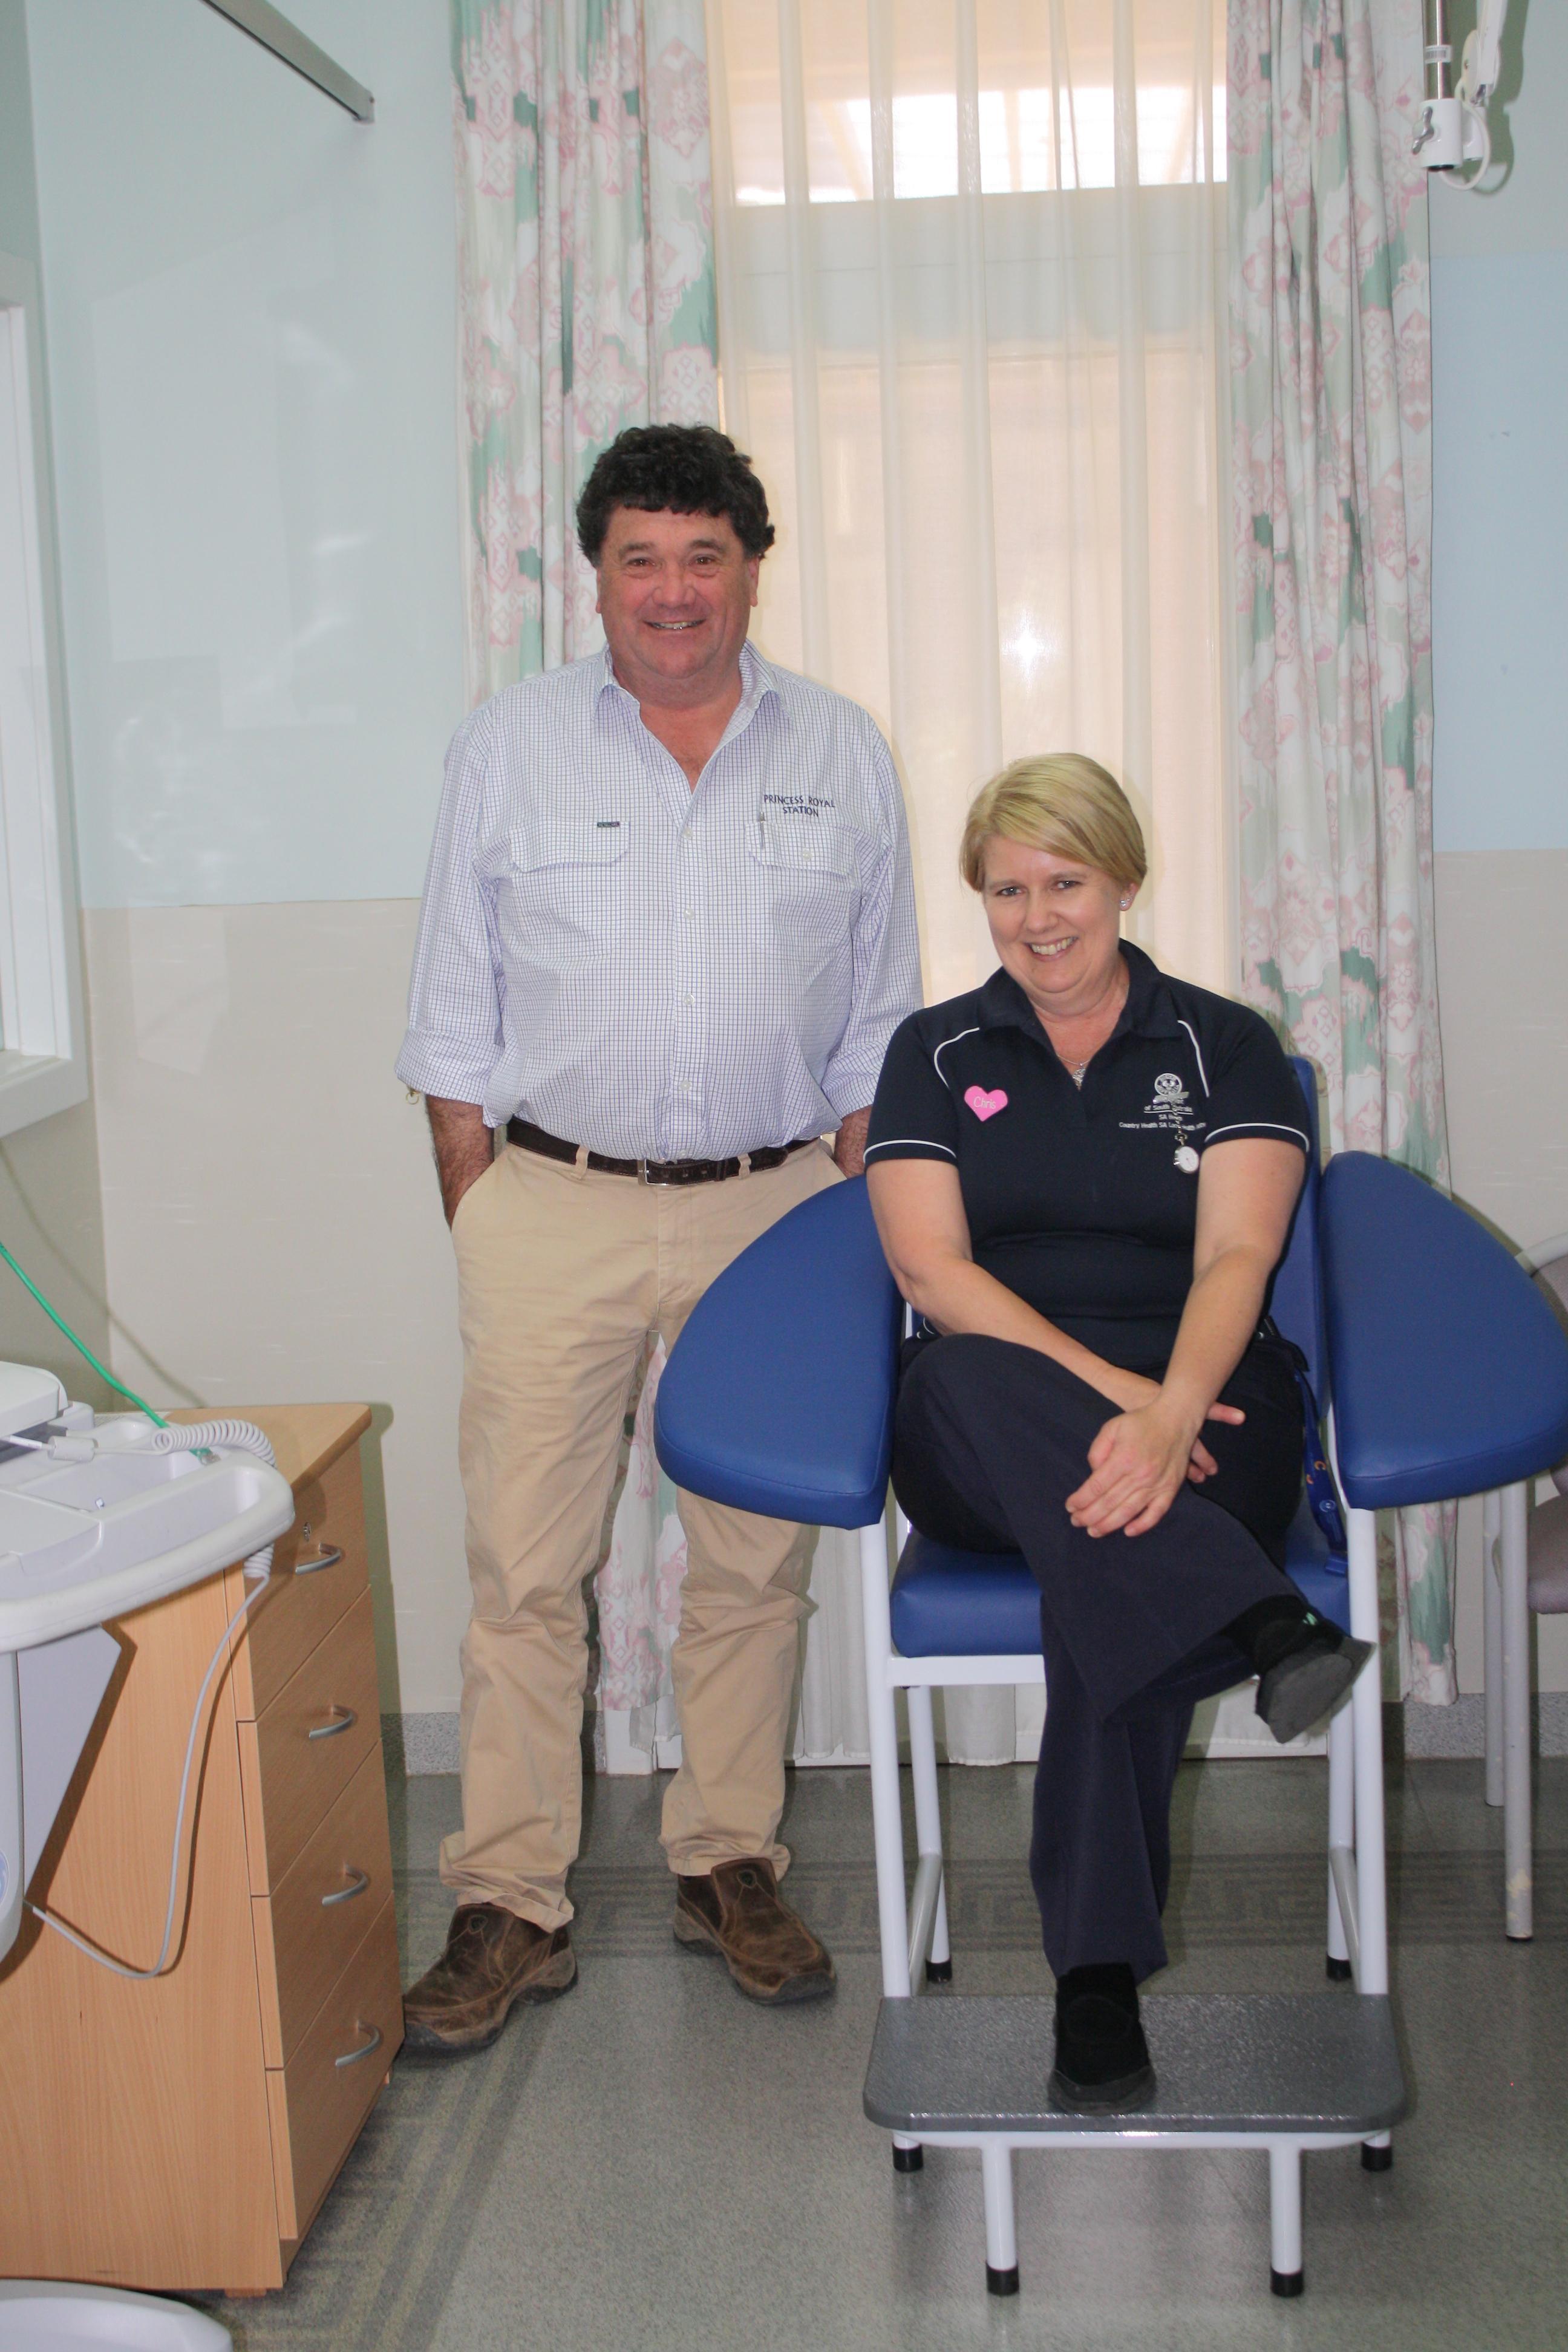 Princess Royal's Simon Rowe and Burra Hospital's Chris Landorf with the new blood collecting chair.